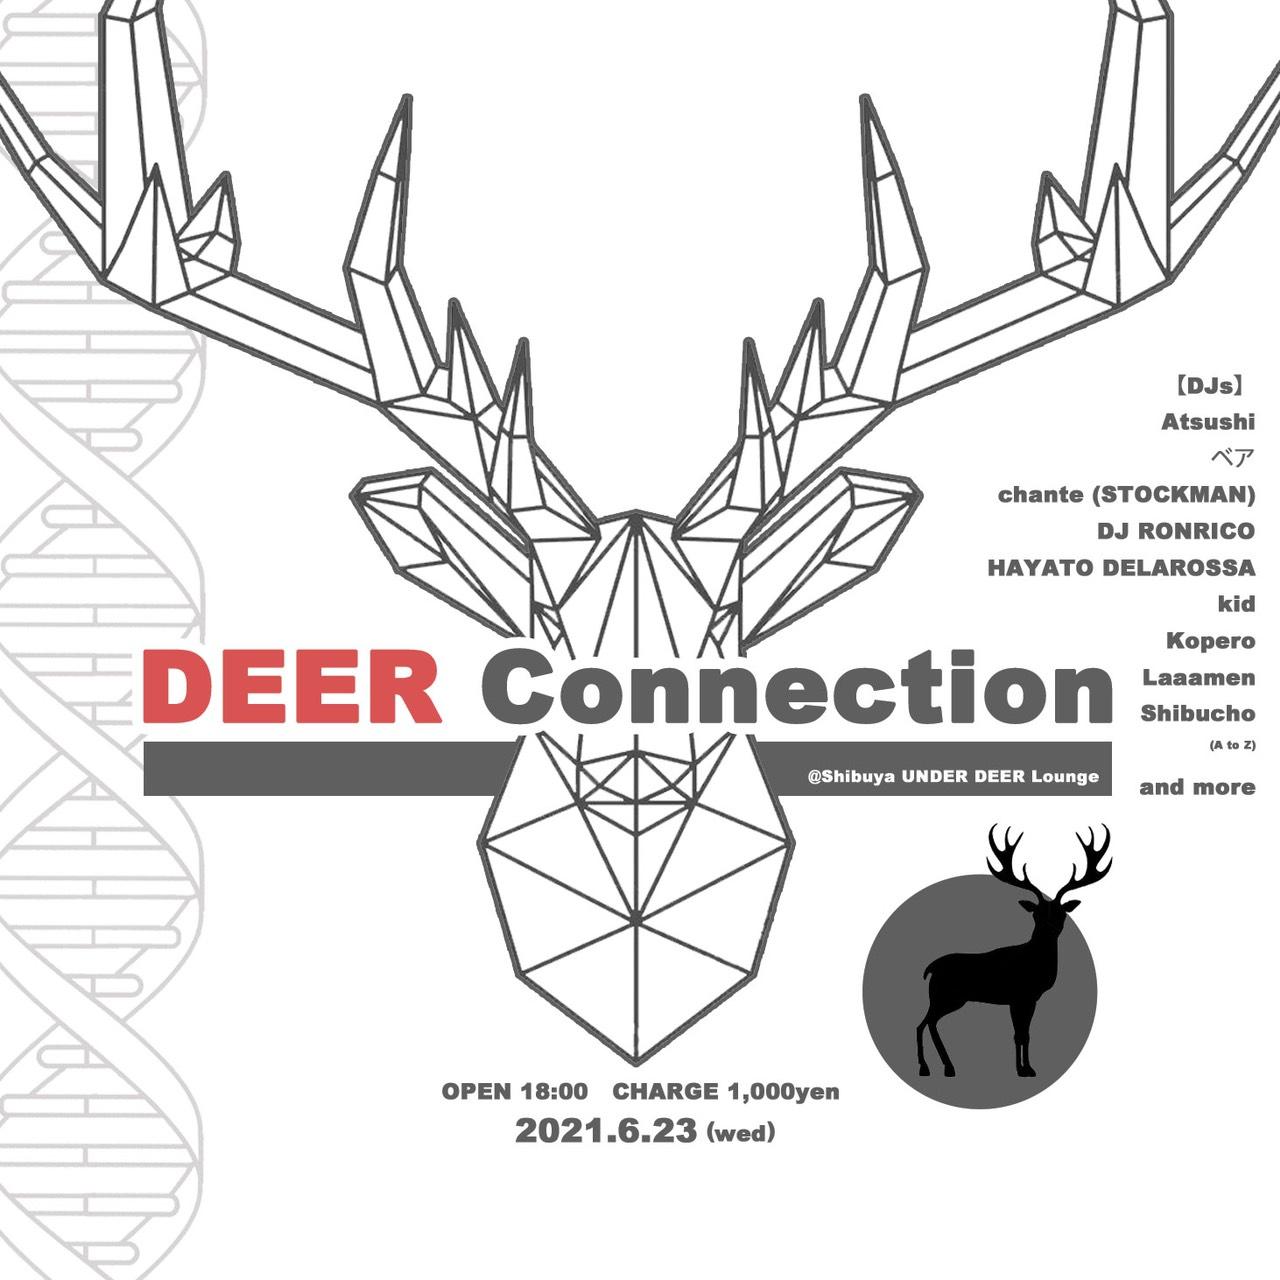 2021.6.23(wed) DEER Connection @渋谷UNDER DEER Lounge